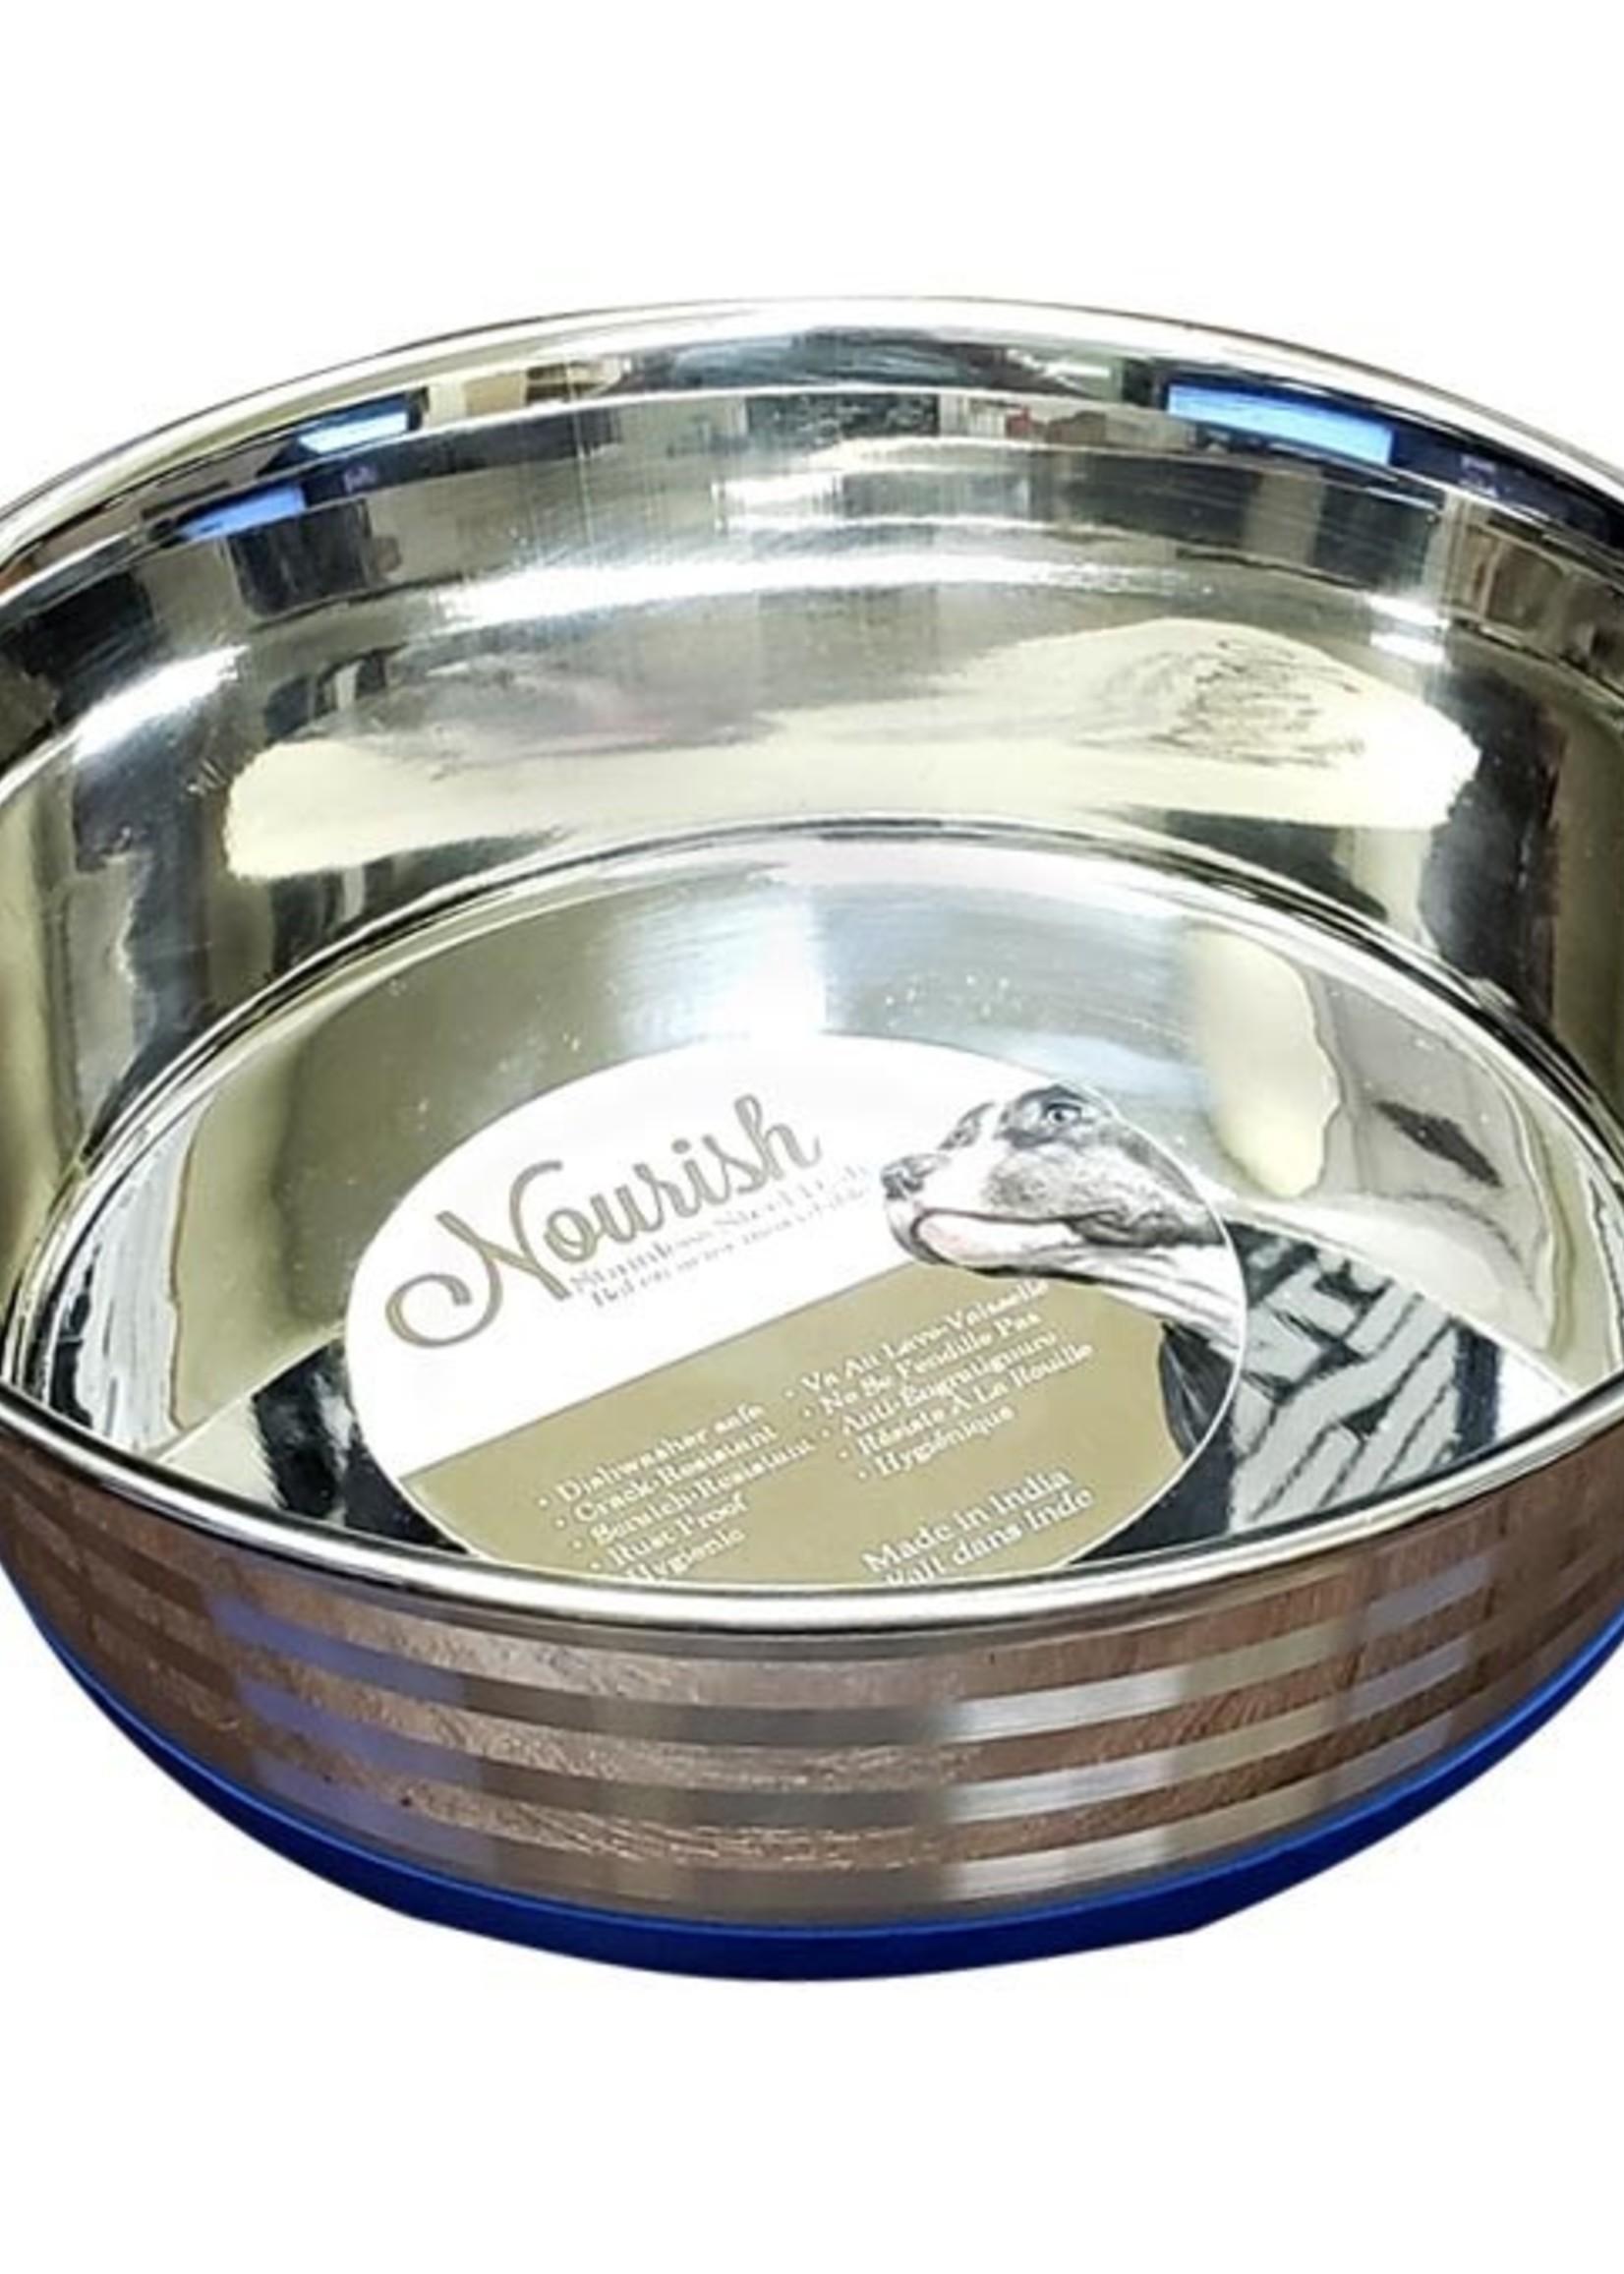 Nourish Stainless Steel Anti-Skid Bowl - Heavy - Stripes 40oz